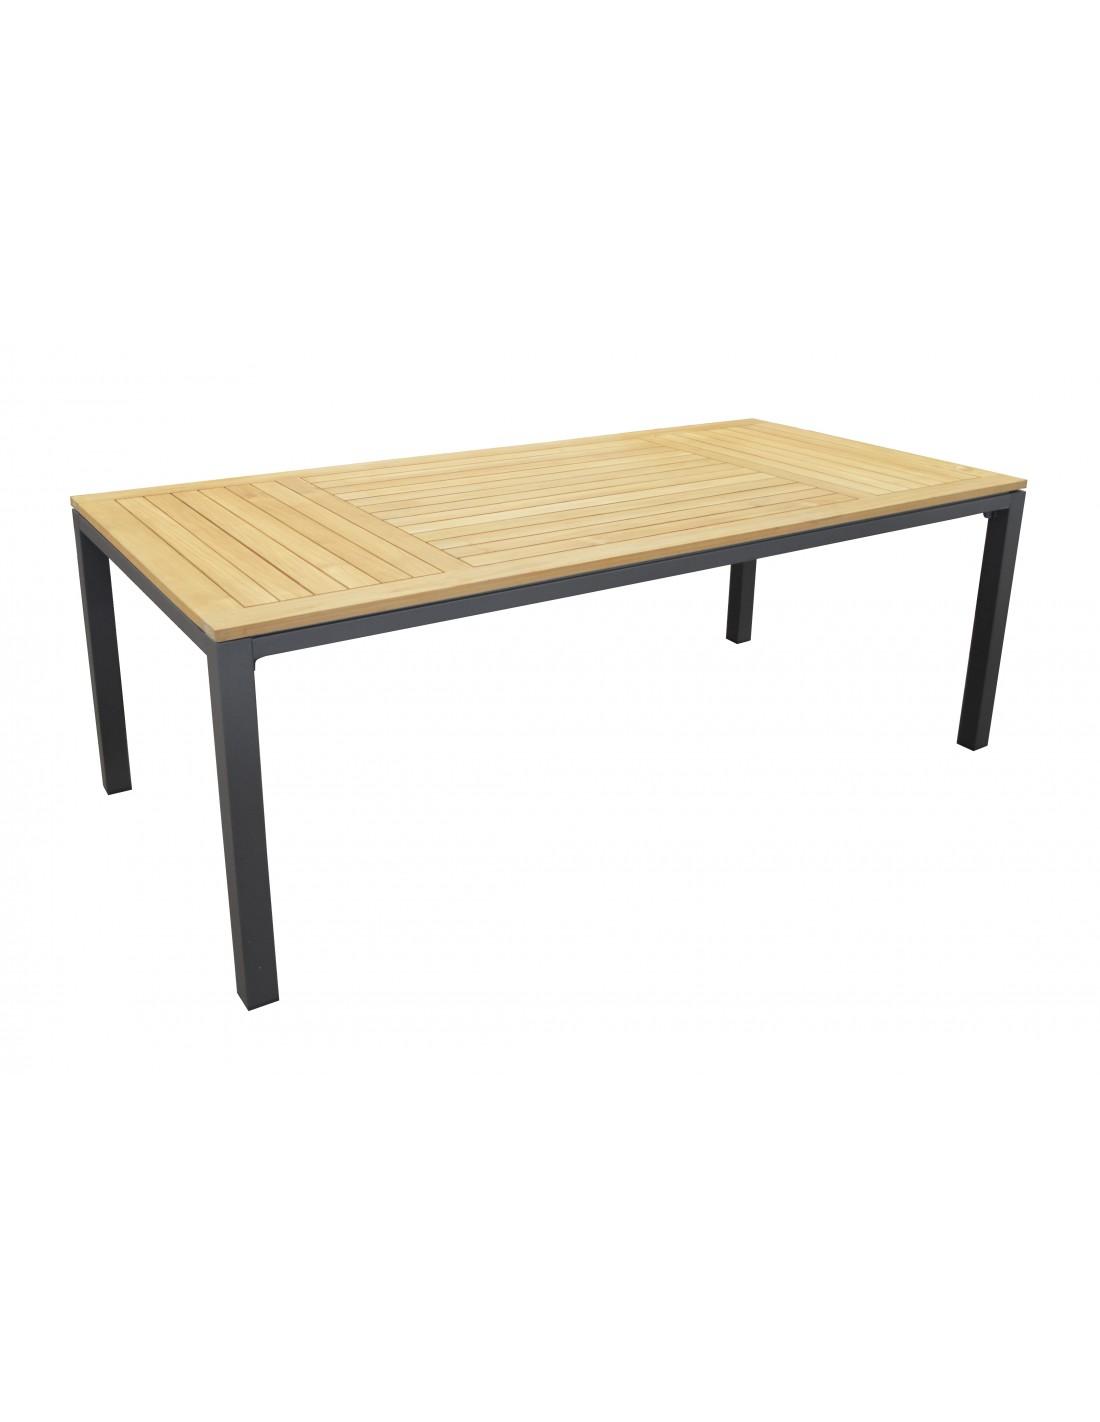 table de jardin 210x100cm en aluminium et teck fsc proloisirs. Black Bedroom Furniture Sets. Home Design Ideas